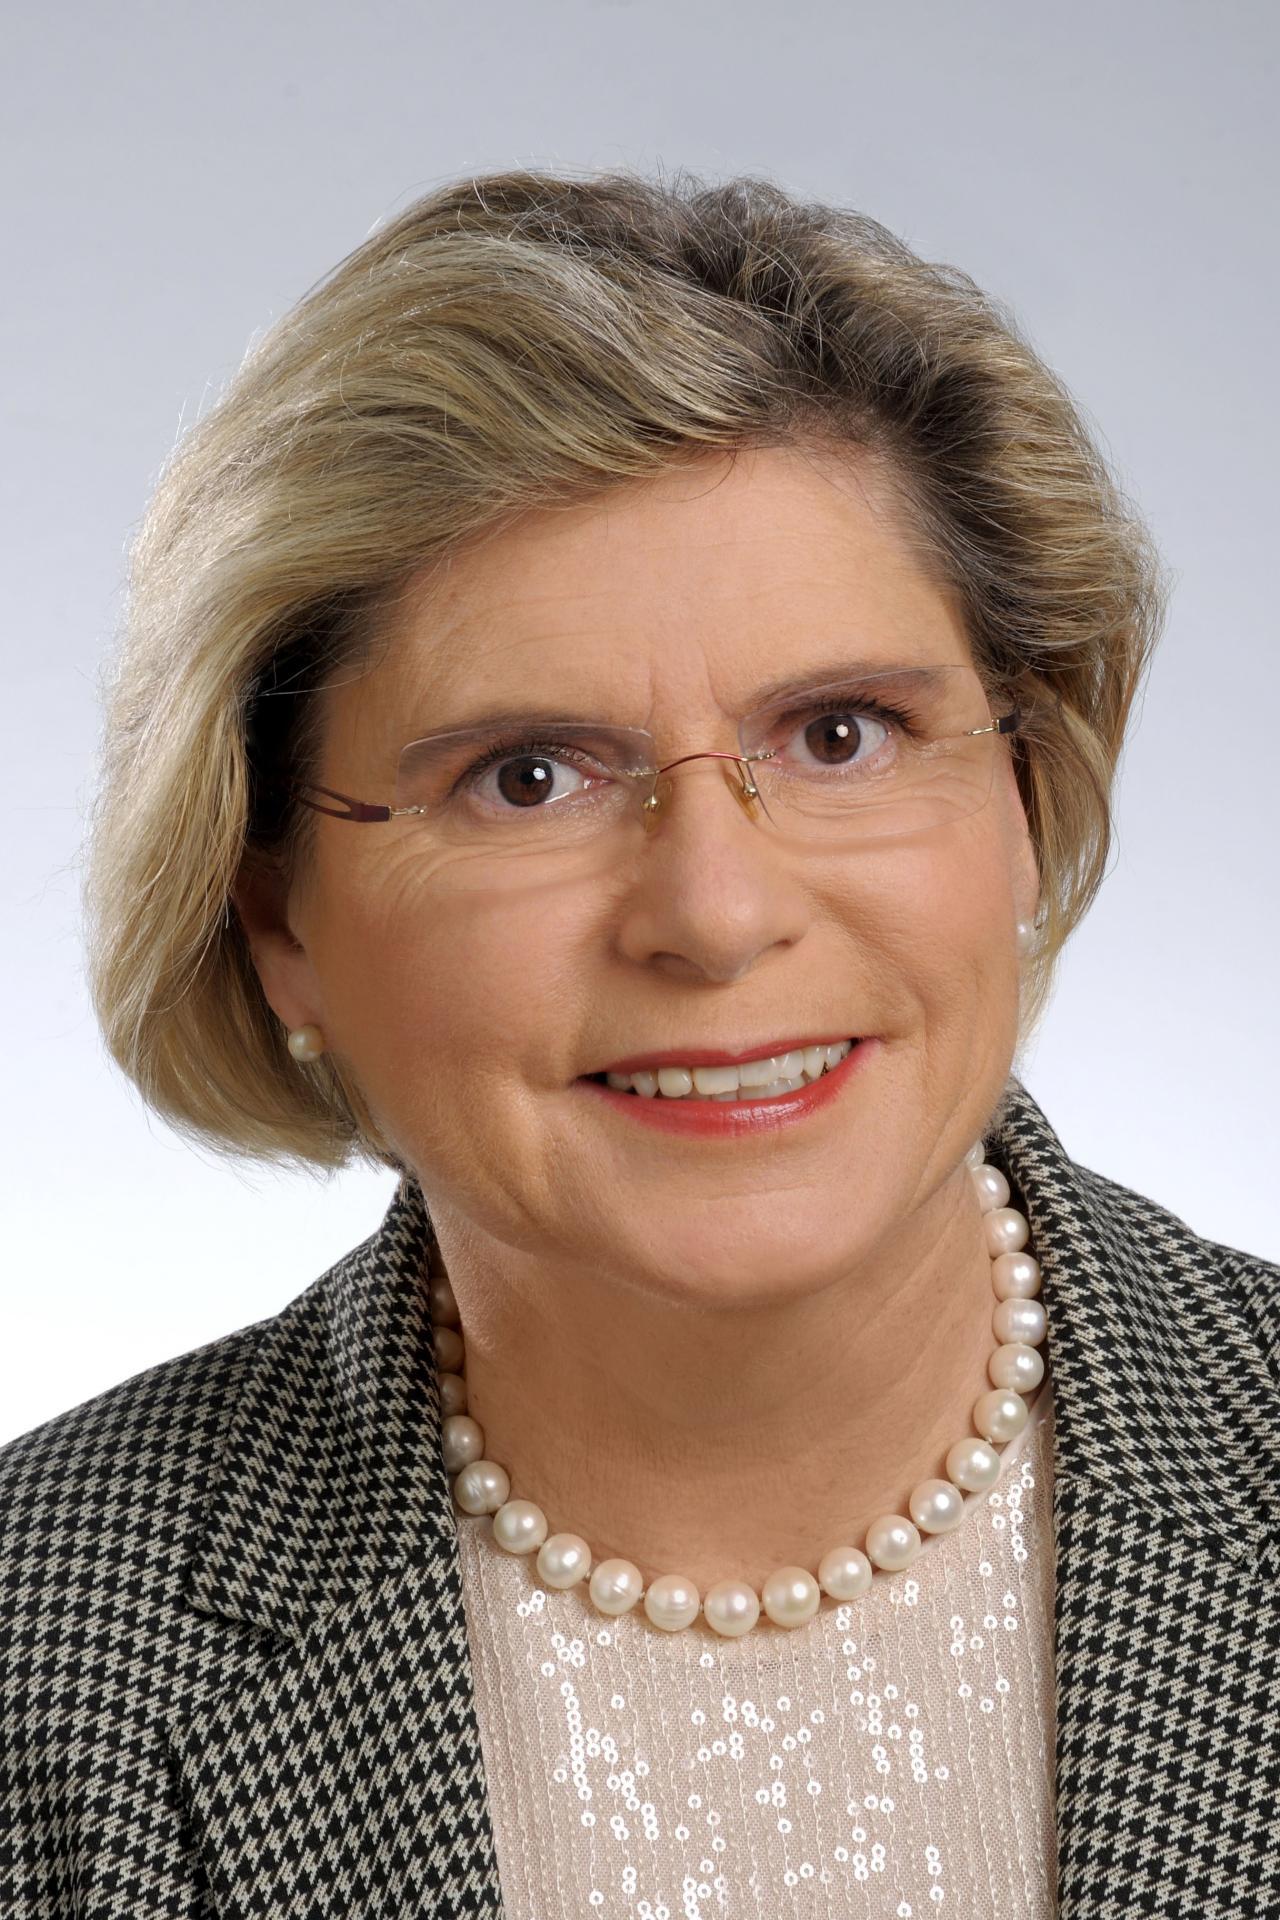 Bürgermeisterin Gertrud Werner